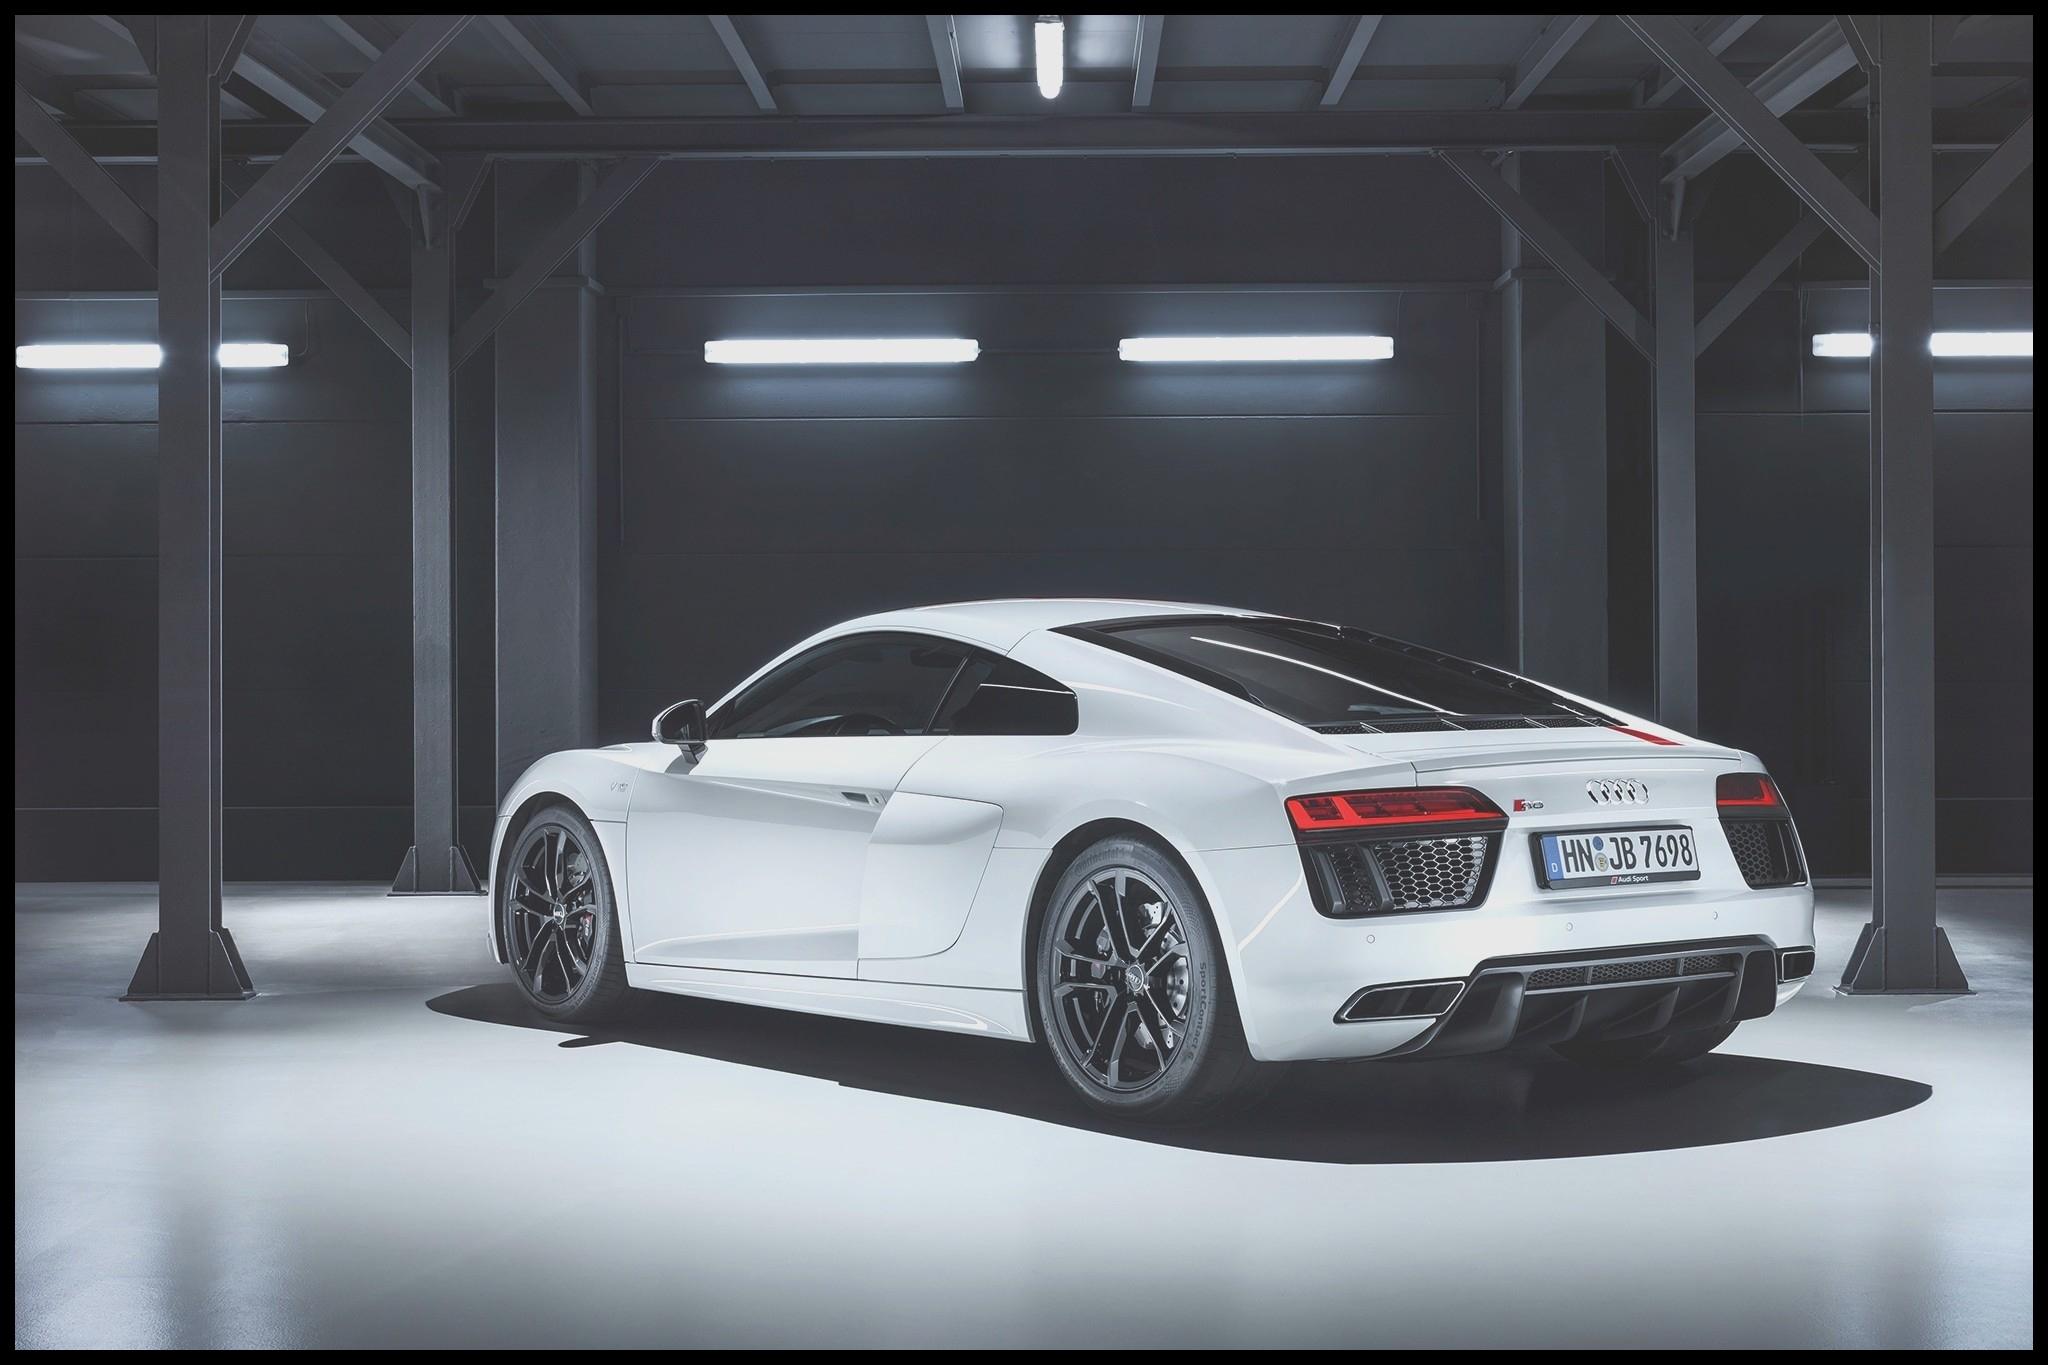 2014 Audi R8 0 60 Audi R8 V10 0 60 Elegant Peachtree Password Recovery V1 0d Crack